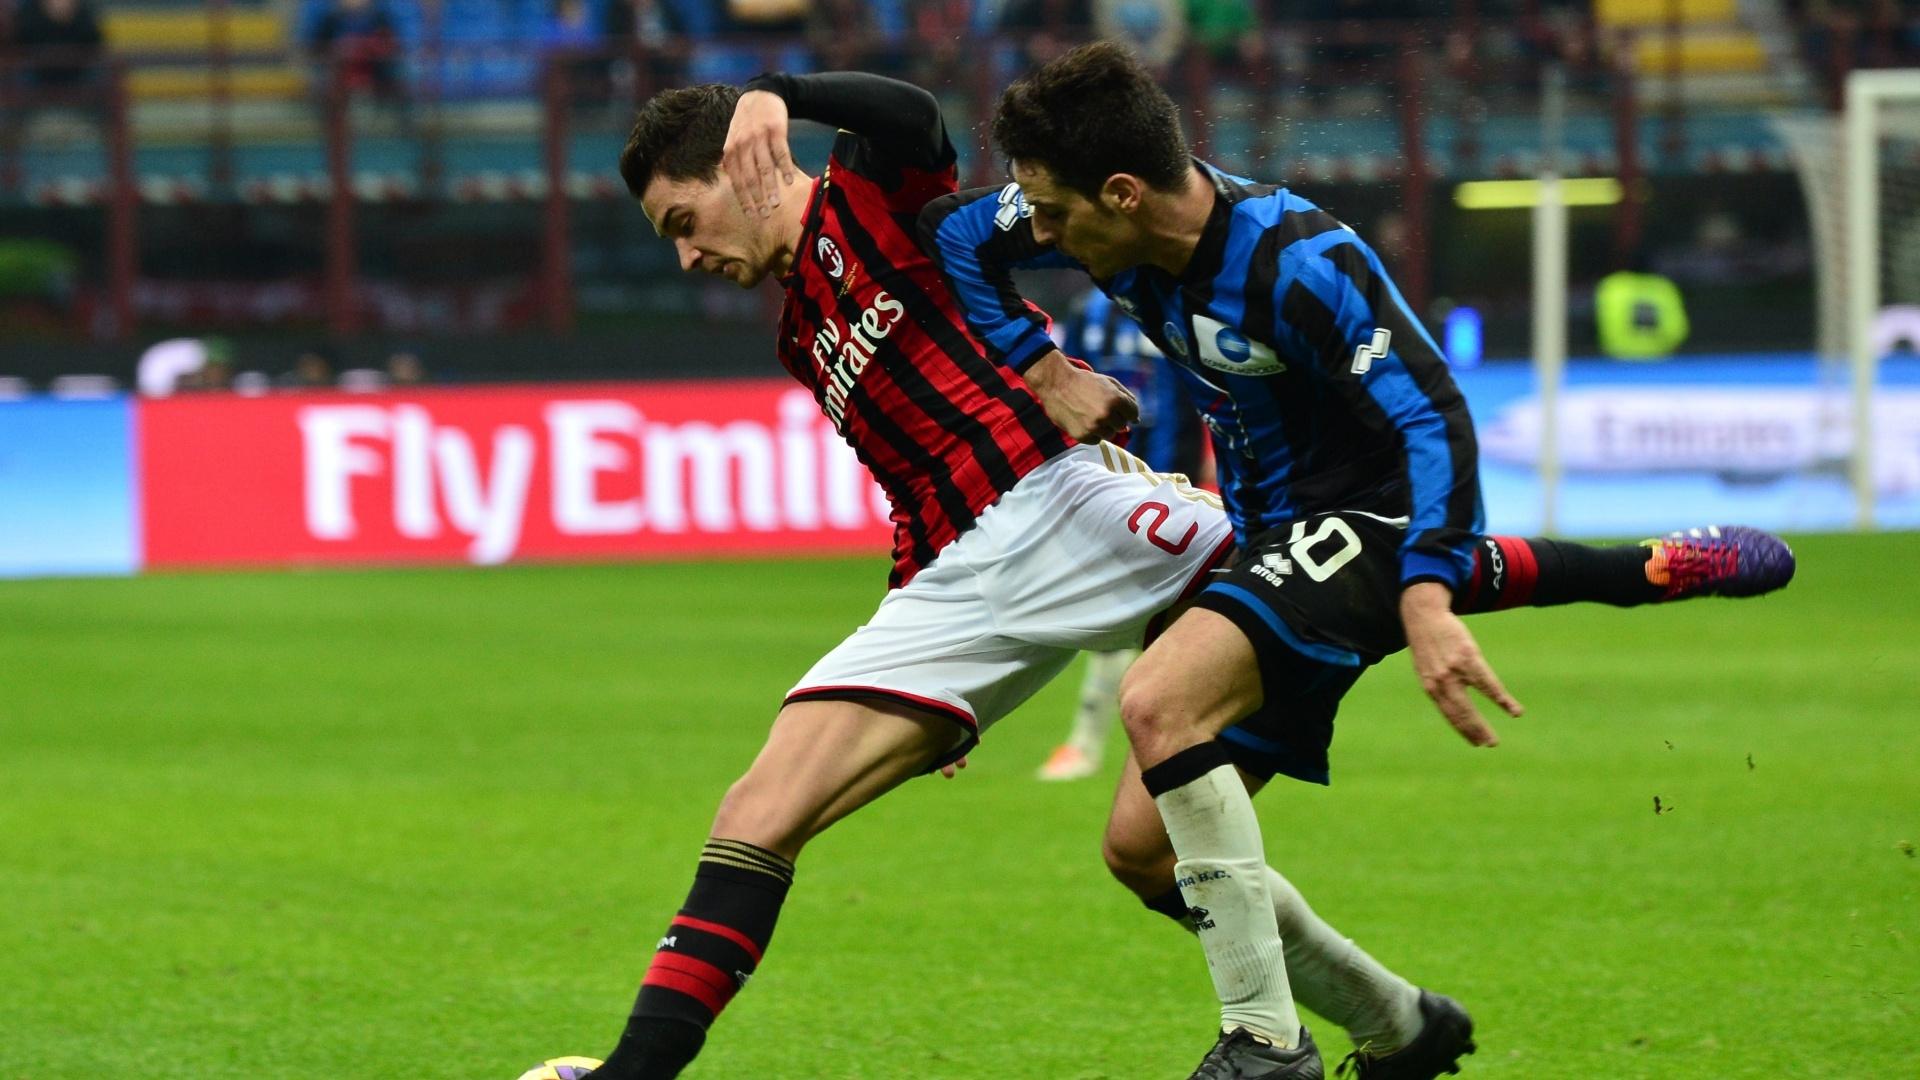 6.jan.2014 - Lateral do Milan, Mattia De Sciglio briga pela bola com o meia Giacomo Bonaventura, do Atalanta